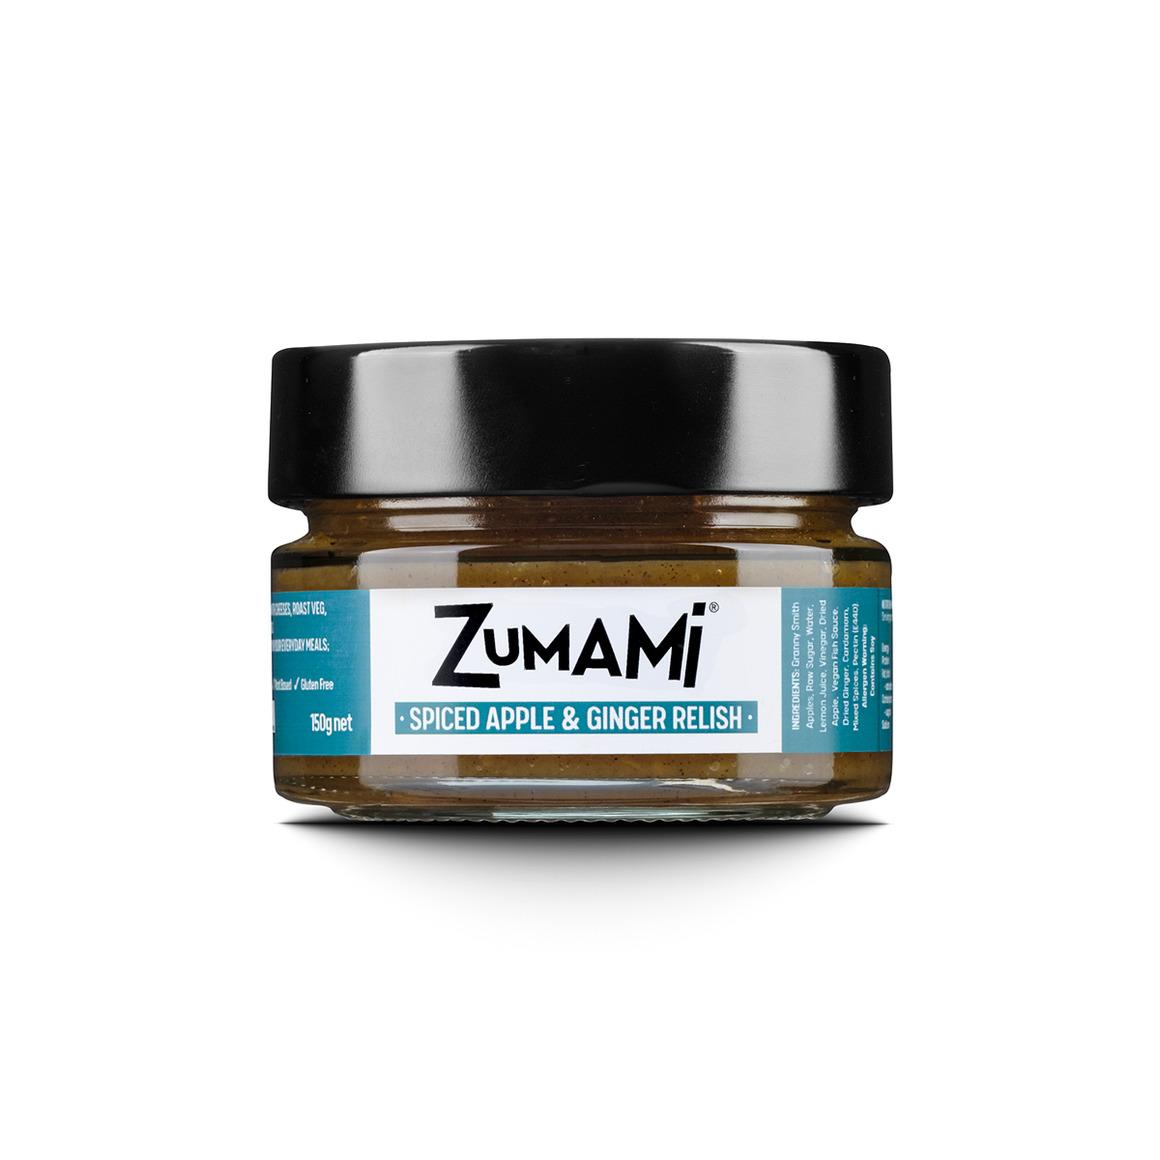 ZUMAMI - Spiced Apple & Ginger Relish | Trada Marketplace